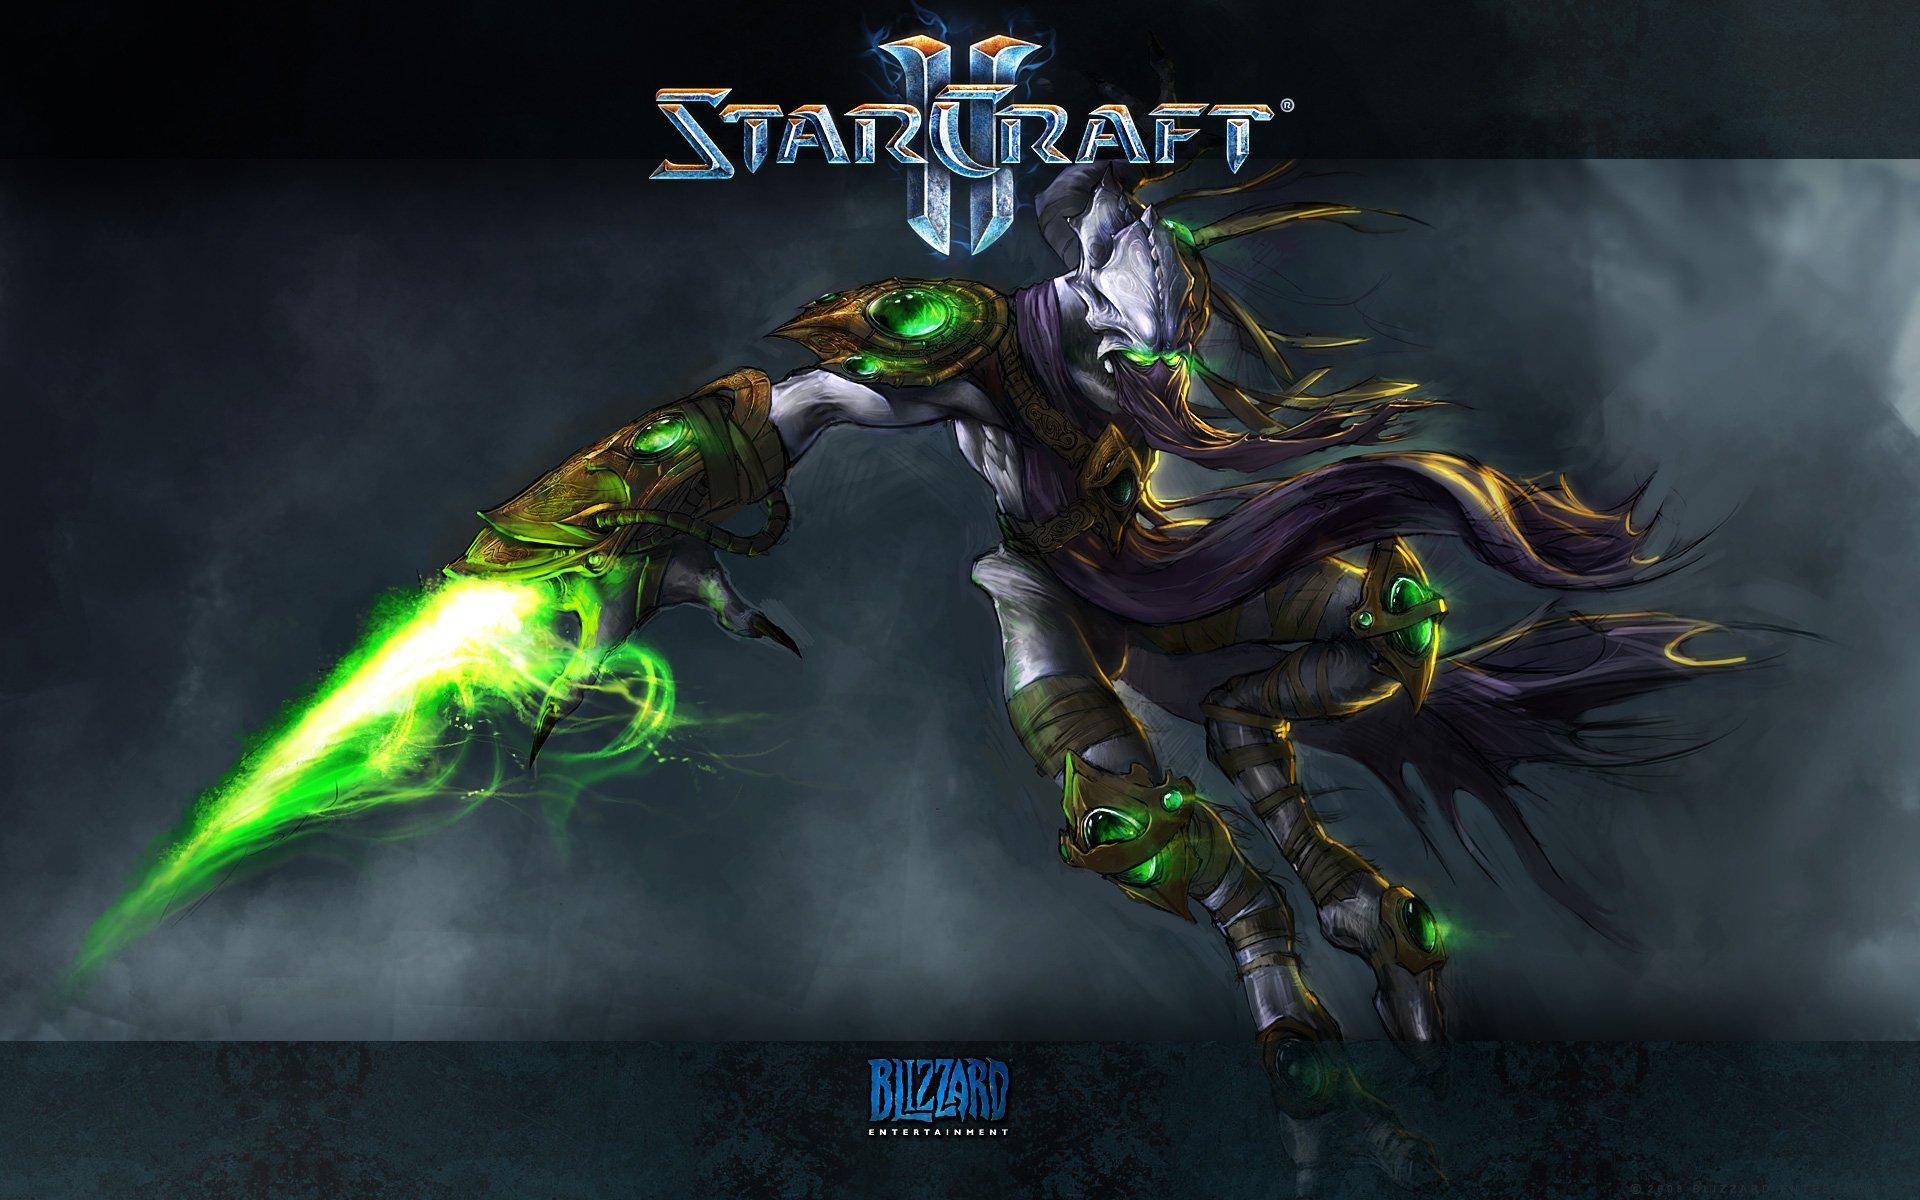 Starcraft HD Wallpapers Backgrounds Wallpaper